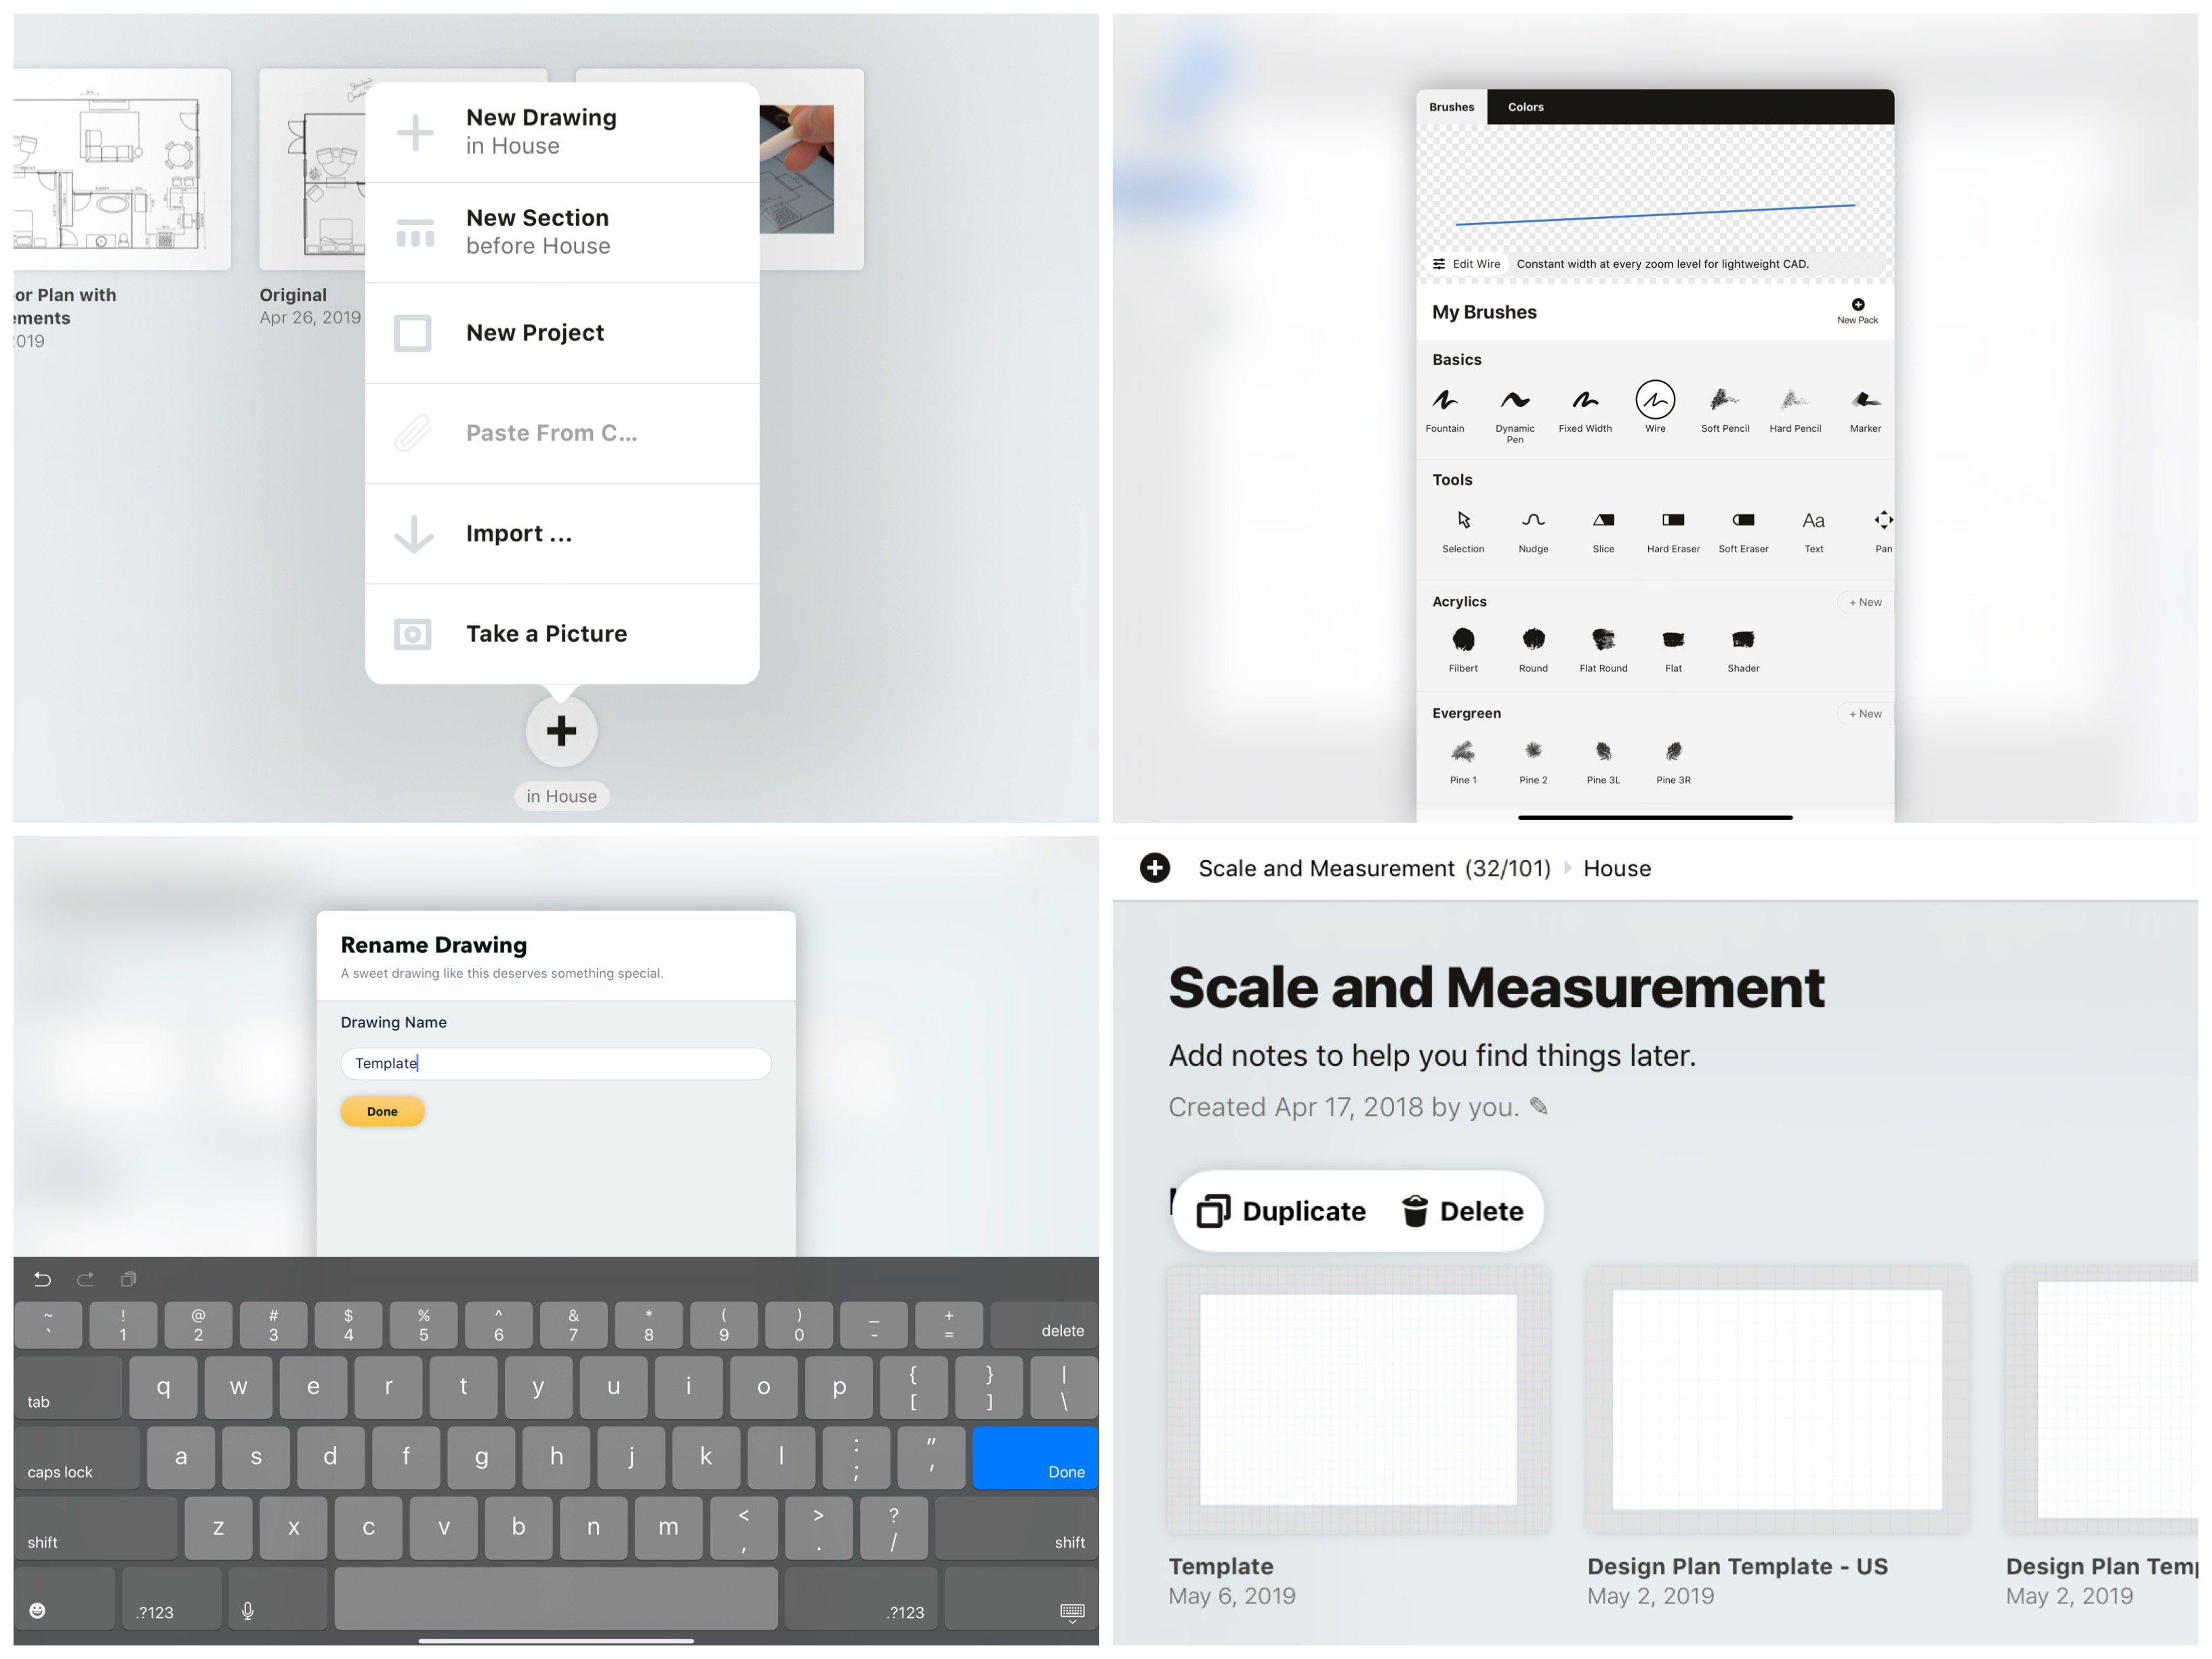 templates_setup.JPG